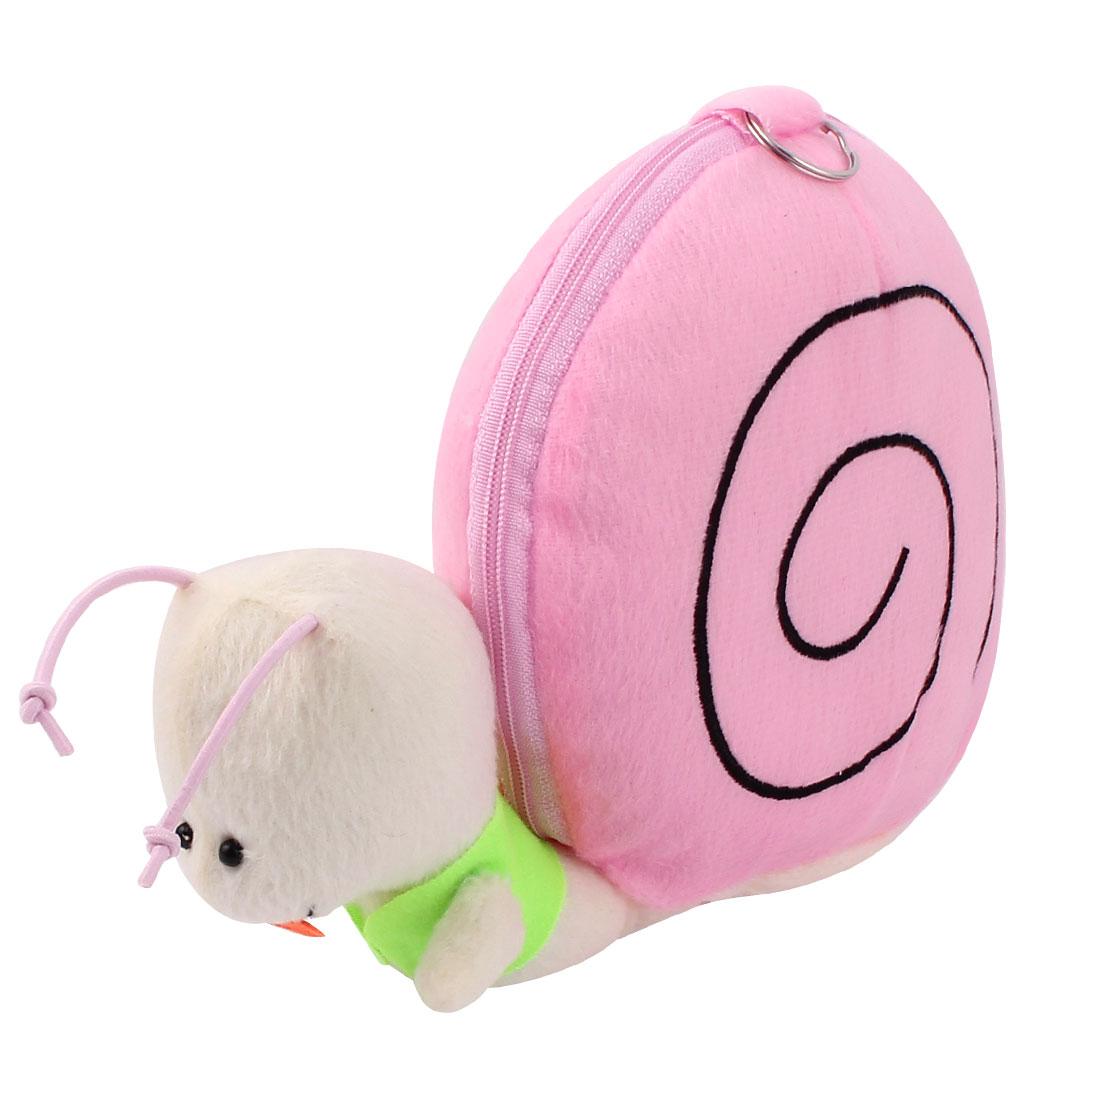 Snail Shape 12 Capacity DVD CD Discs Holder Storage Bag Album Box Pink